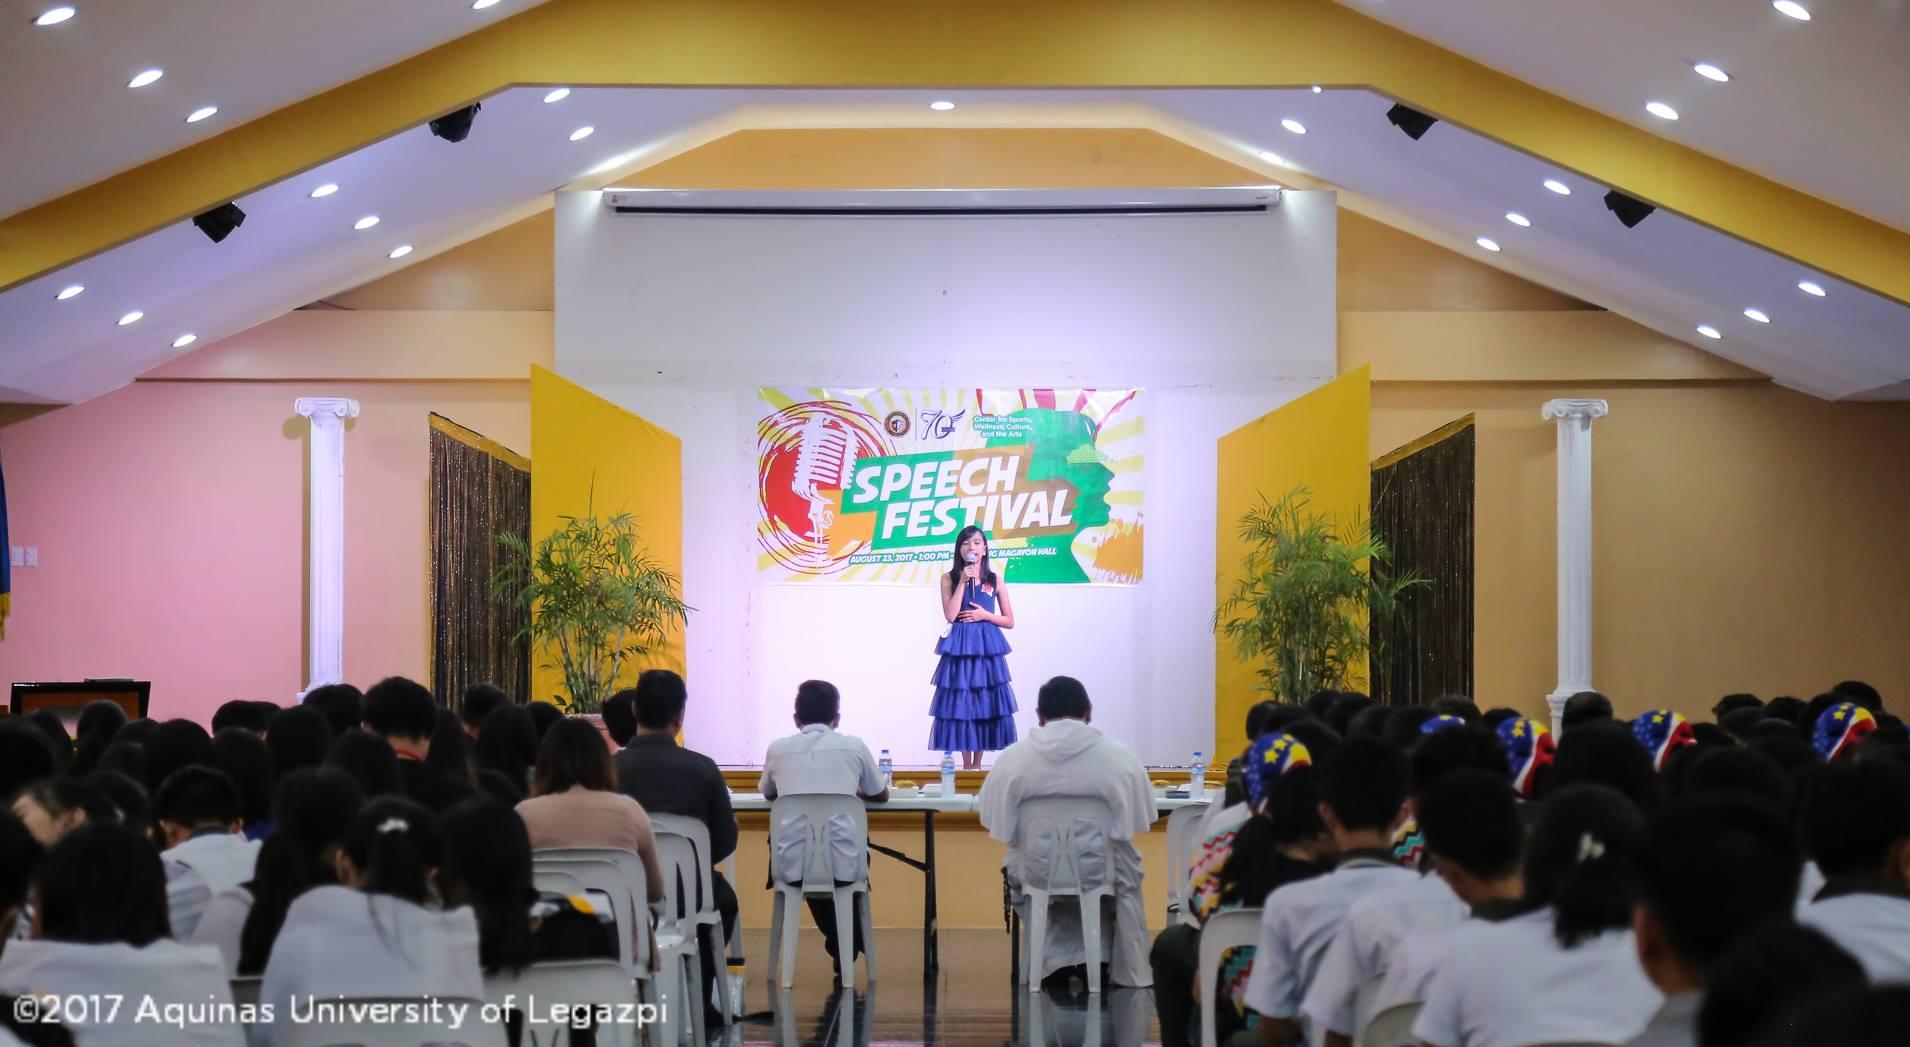 Speech Festival 2017